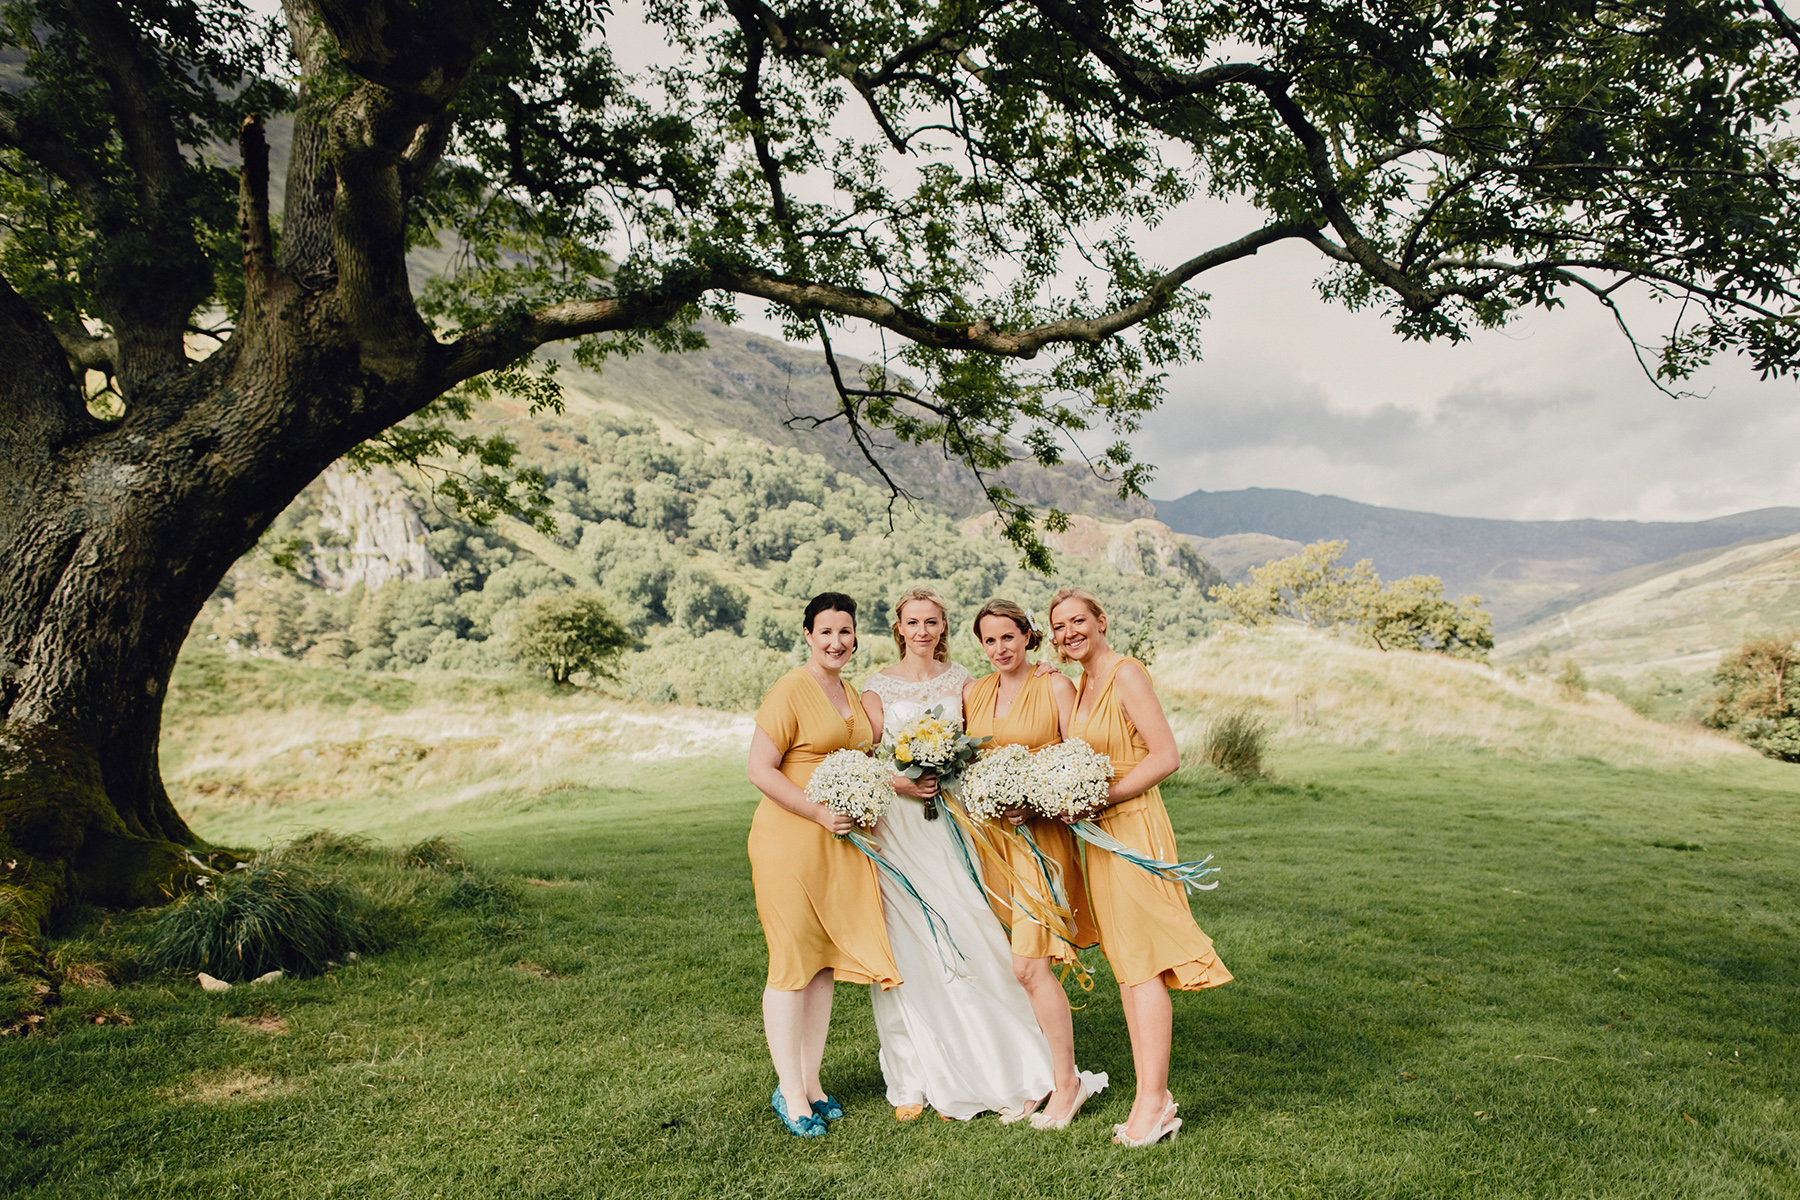 Snowdonia-Wales-Wedding-Photos-0345.jpg